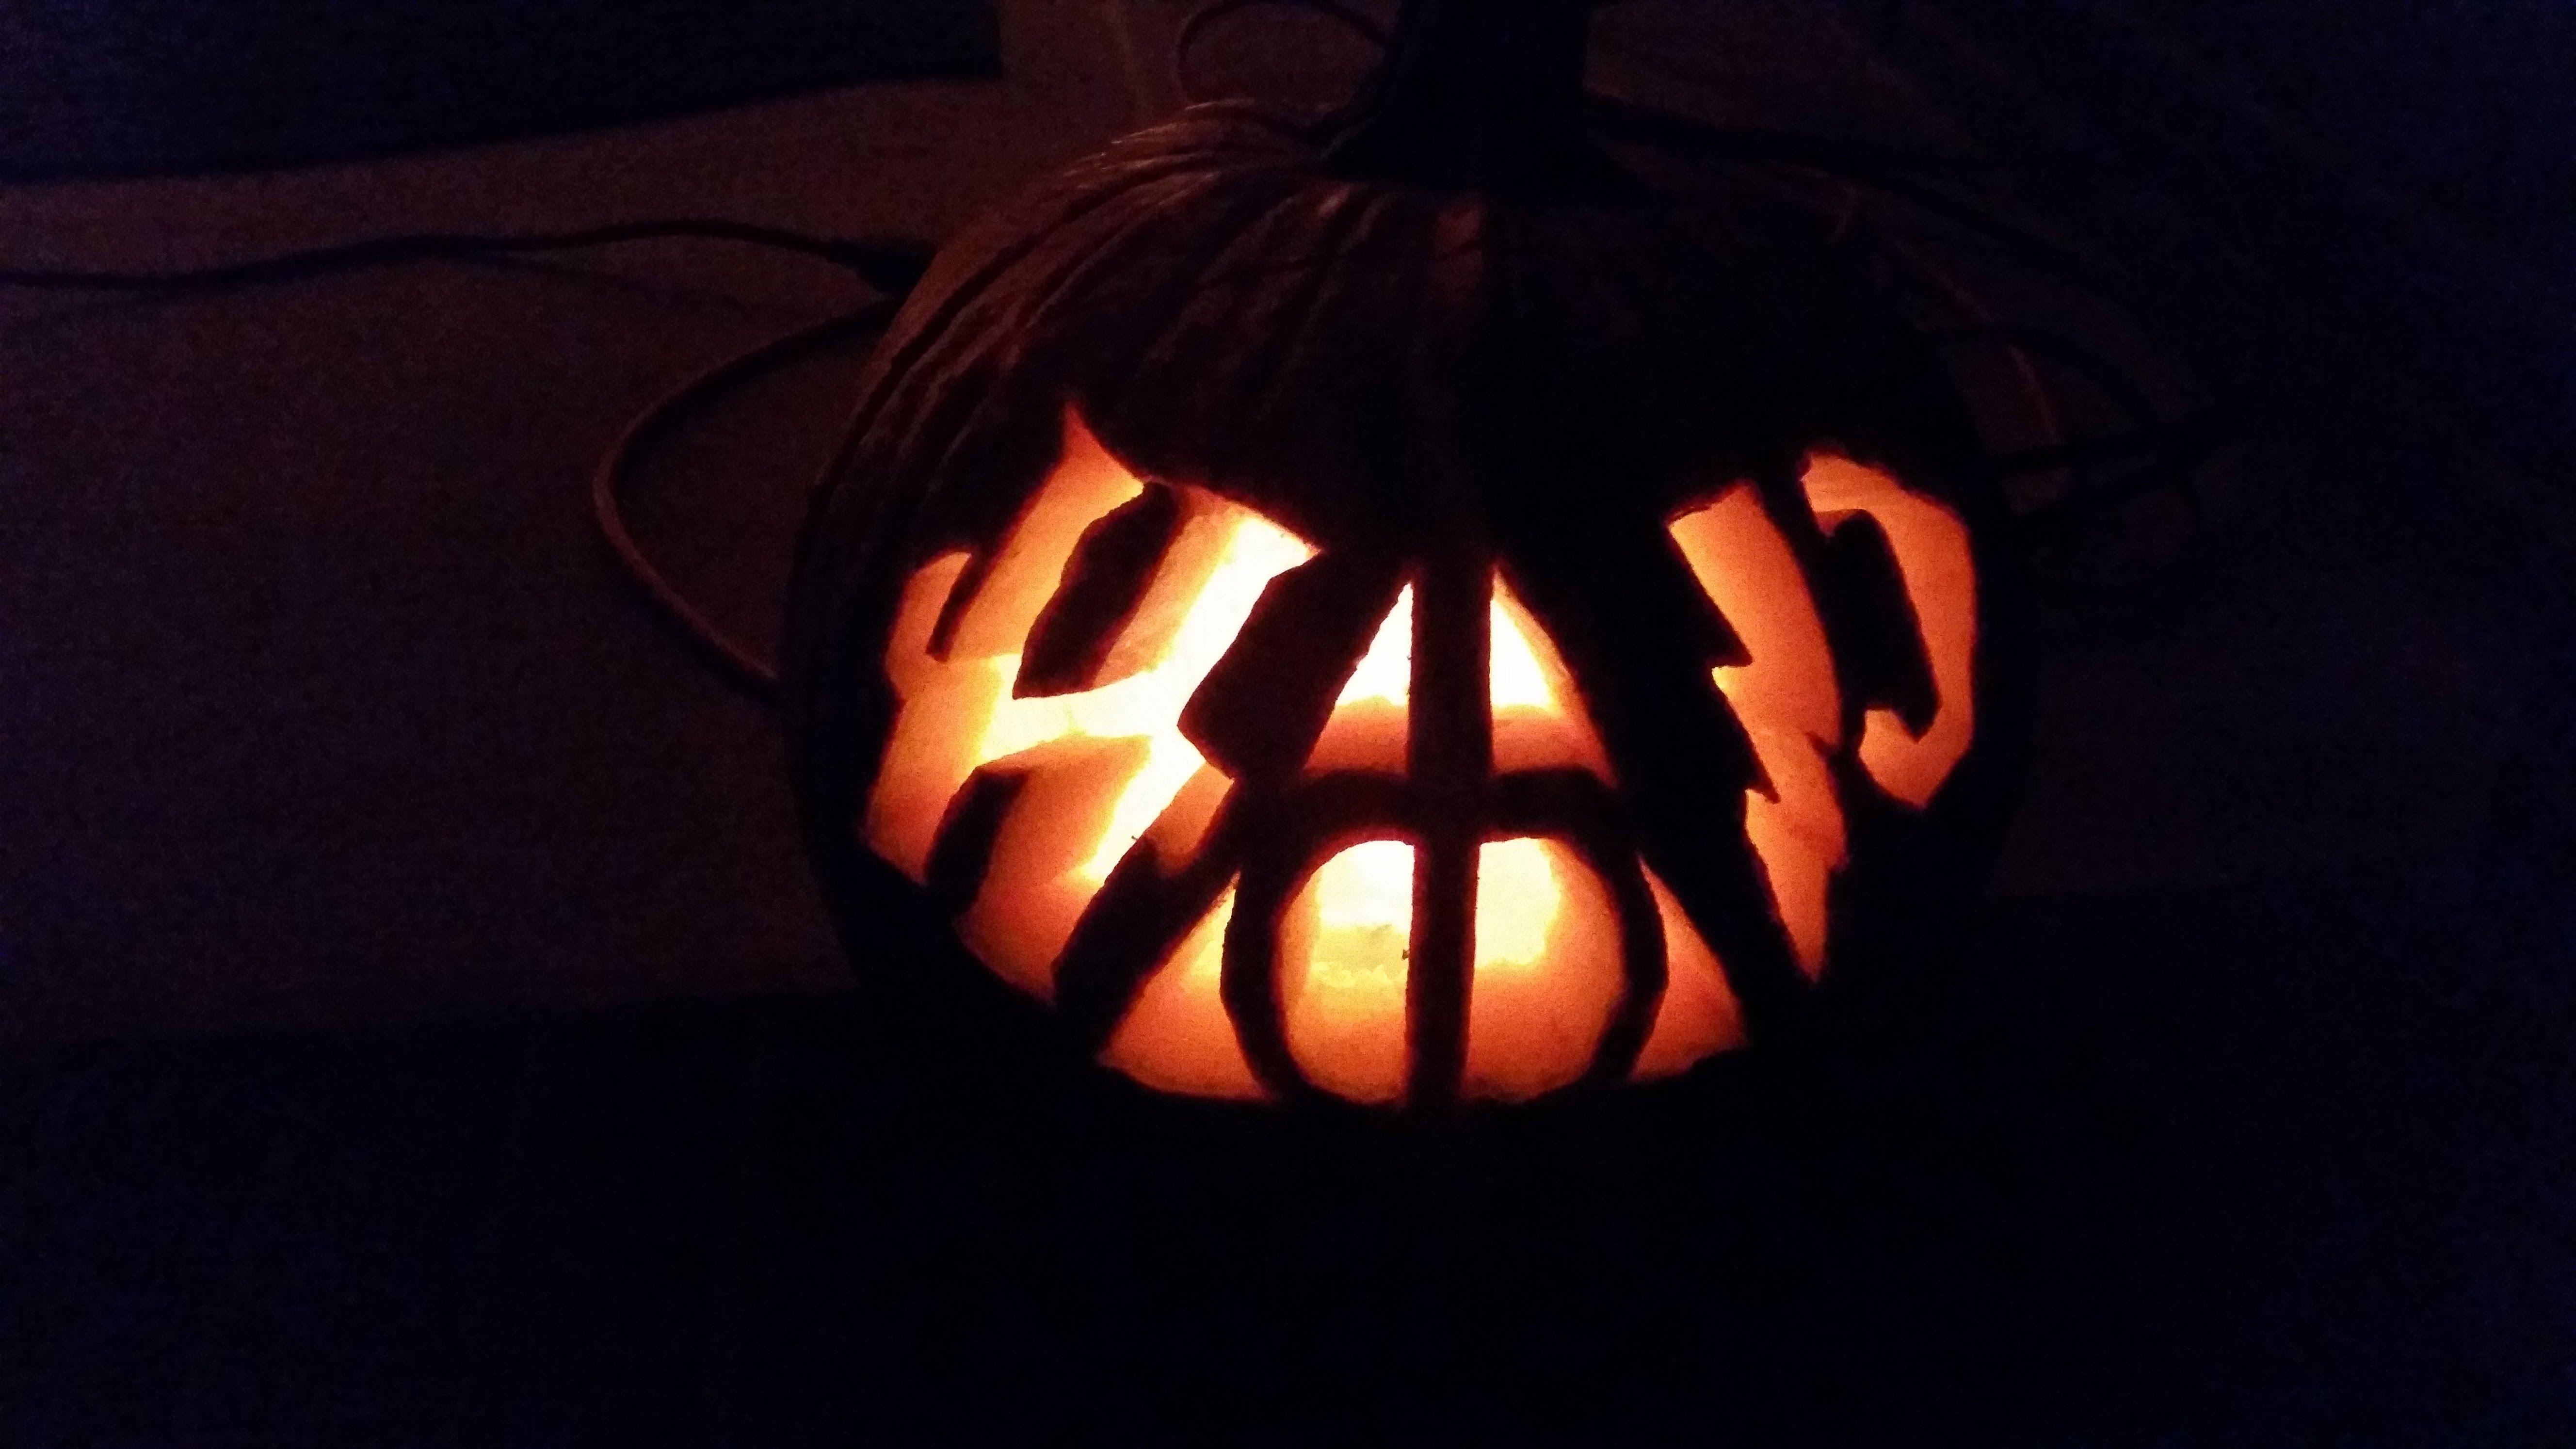 Harry Potter Deathly Hallows Halloween Pumpkin Carving Design Pumkincarvingdesigns Harry Potter Harry Potter Kurbis Halloween Kurbis Kurbisschnitzmuster